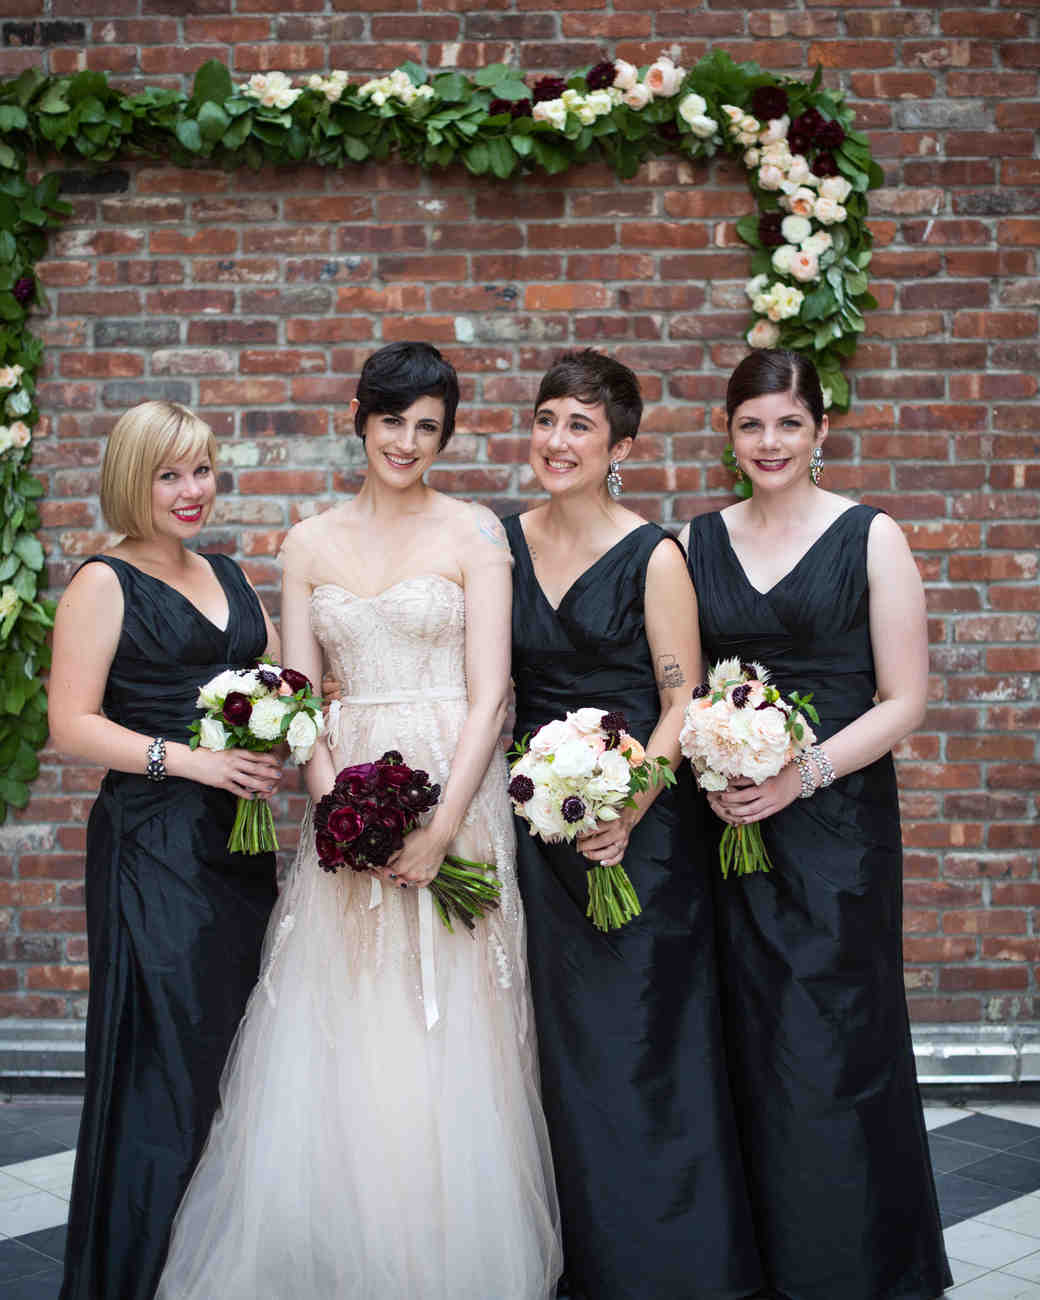 caitlin-michael-wedding-bridesmaids-204-s111835-0415.jpg